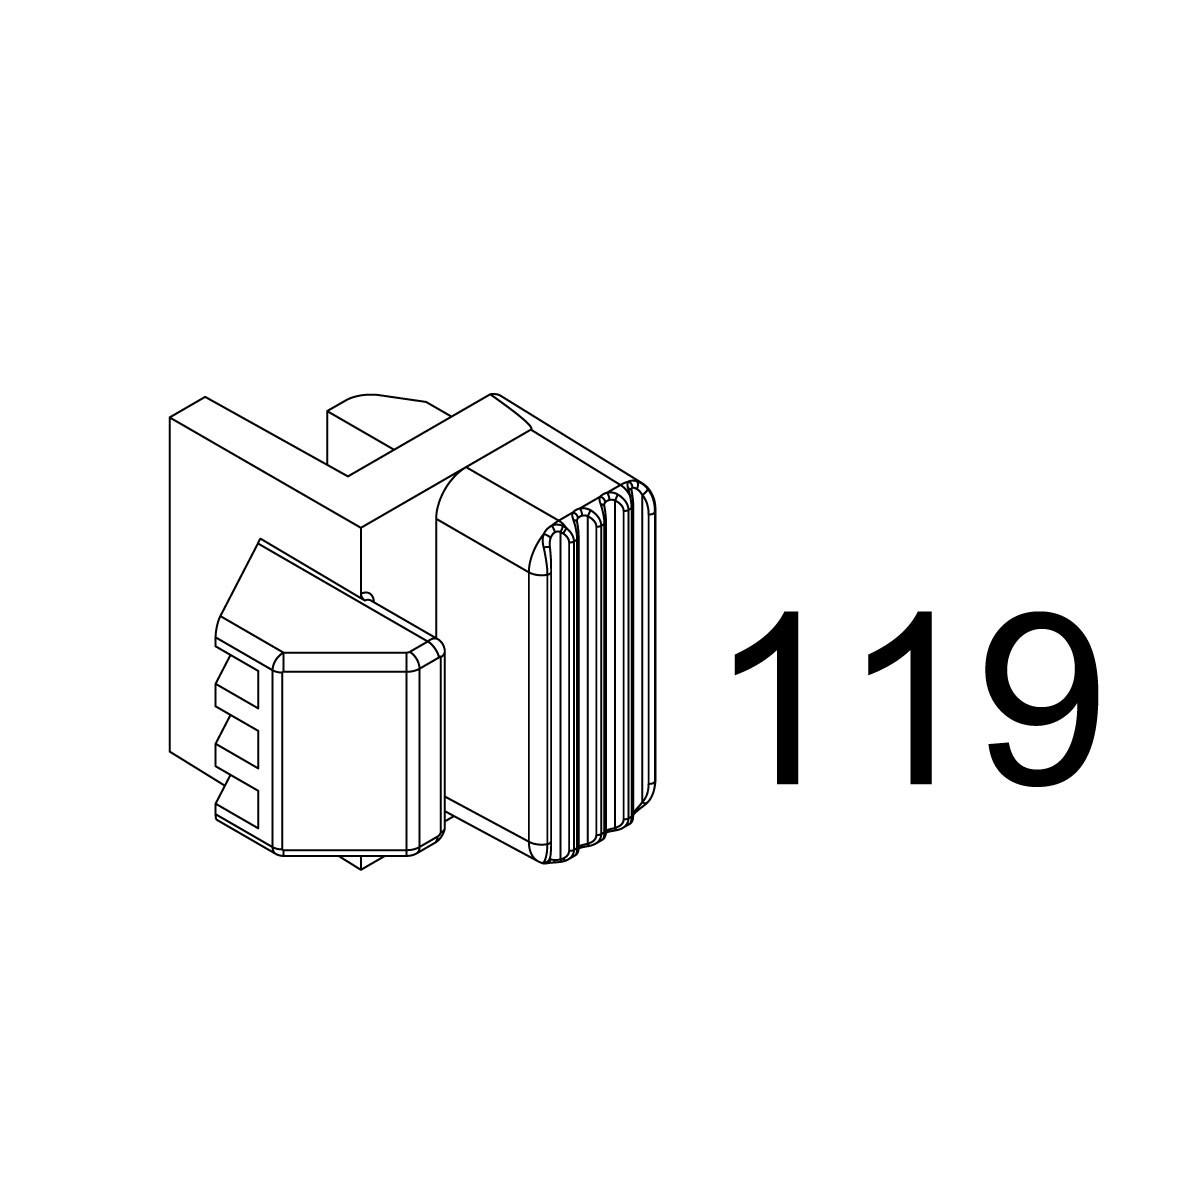 WE MSK GBBR Part 119 Adjustable Stock Positioning Piece